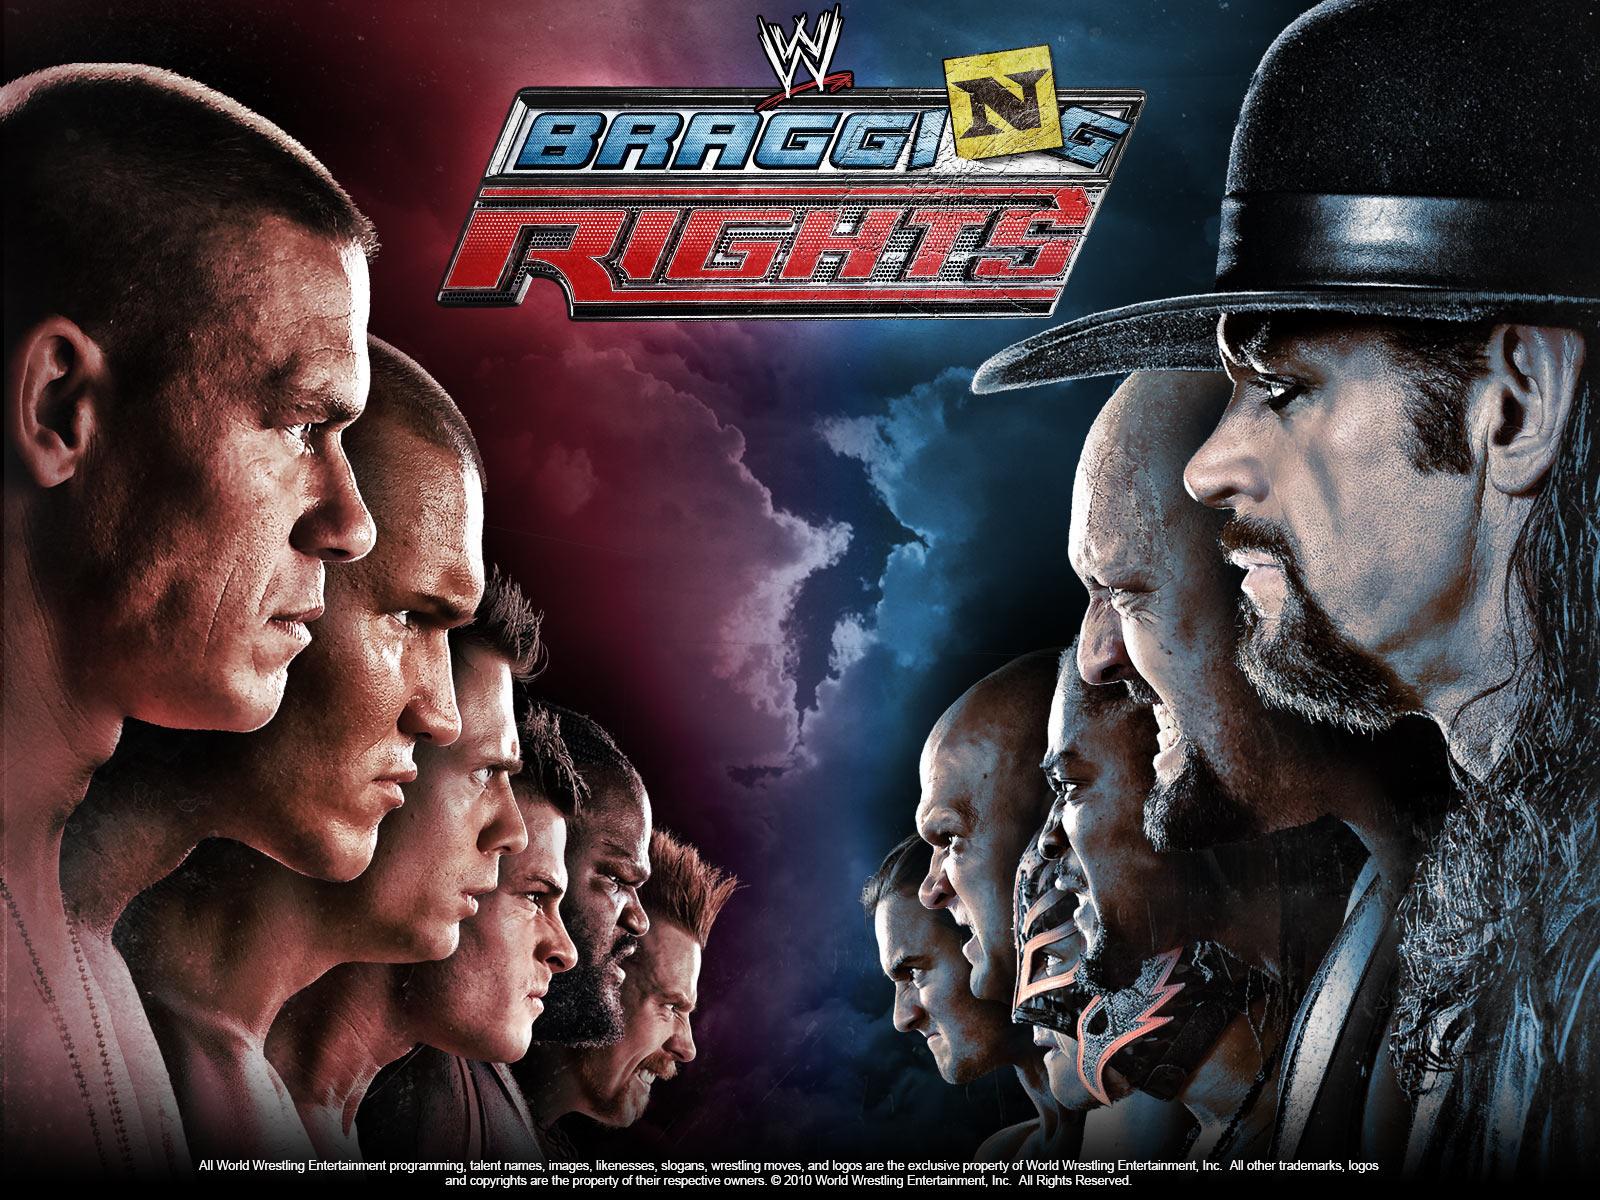 Royal Rumble - Wikipedia, the free encyclopedia